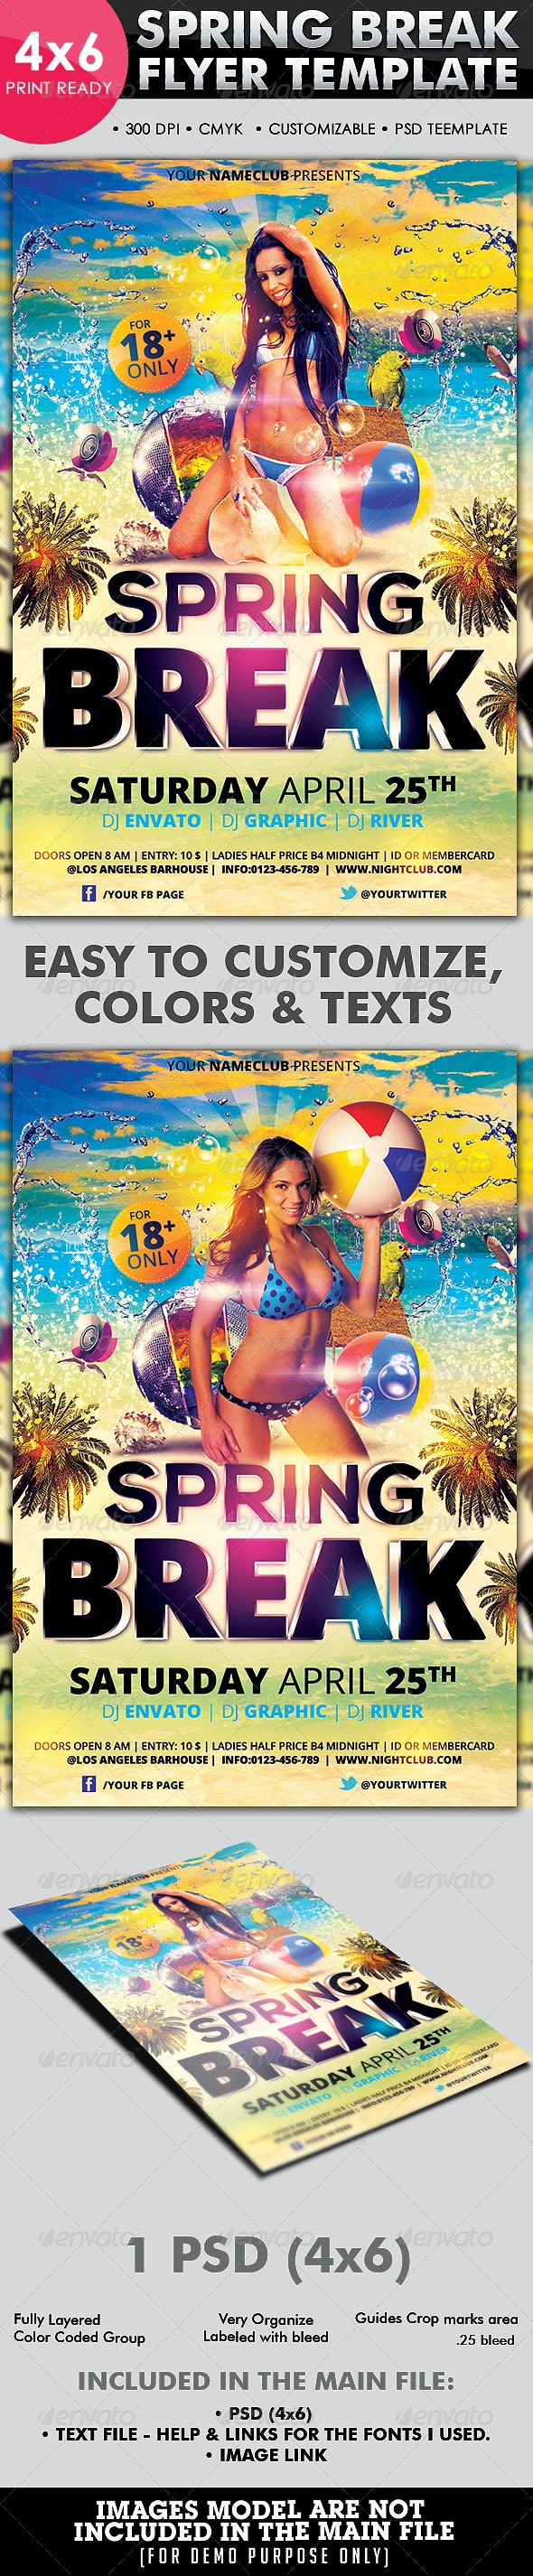 Spring Break Flyer Template - Flyers Print Templates